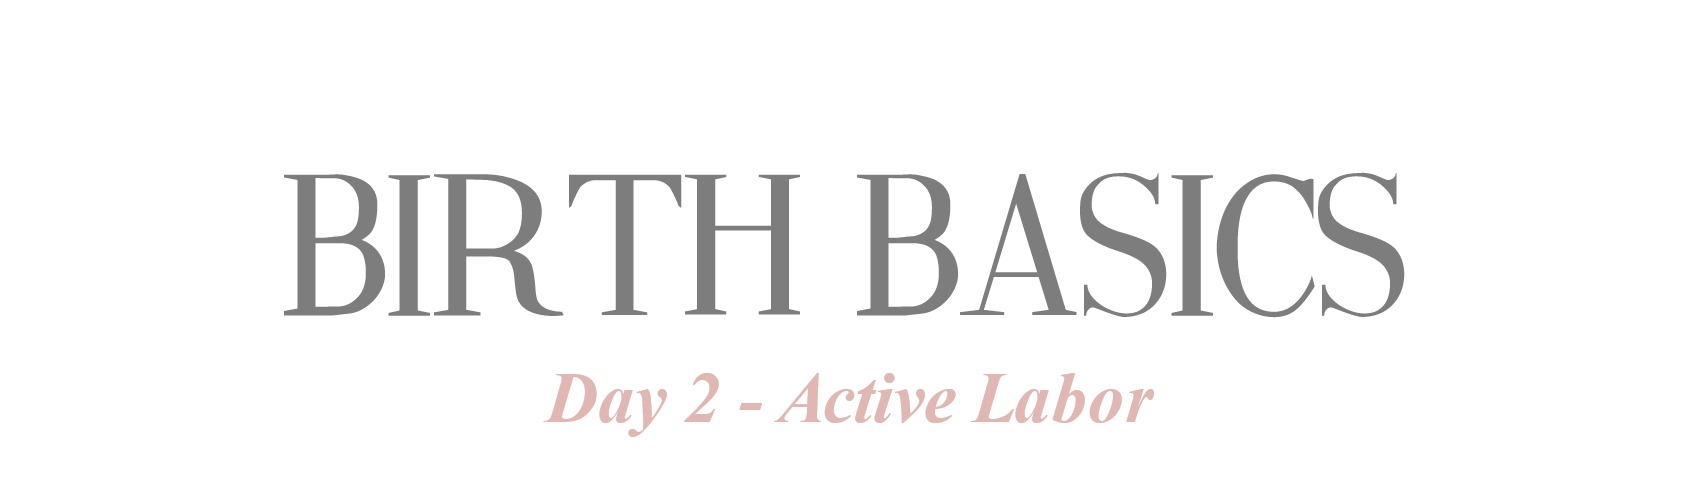 Birth Basics - Day 2 - Active Labor.jpg